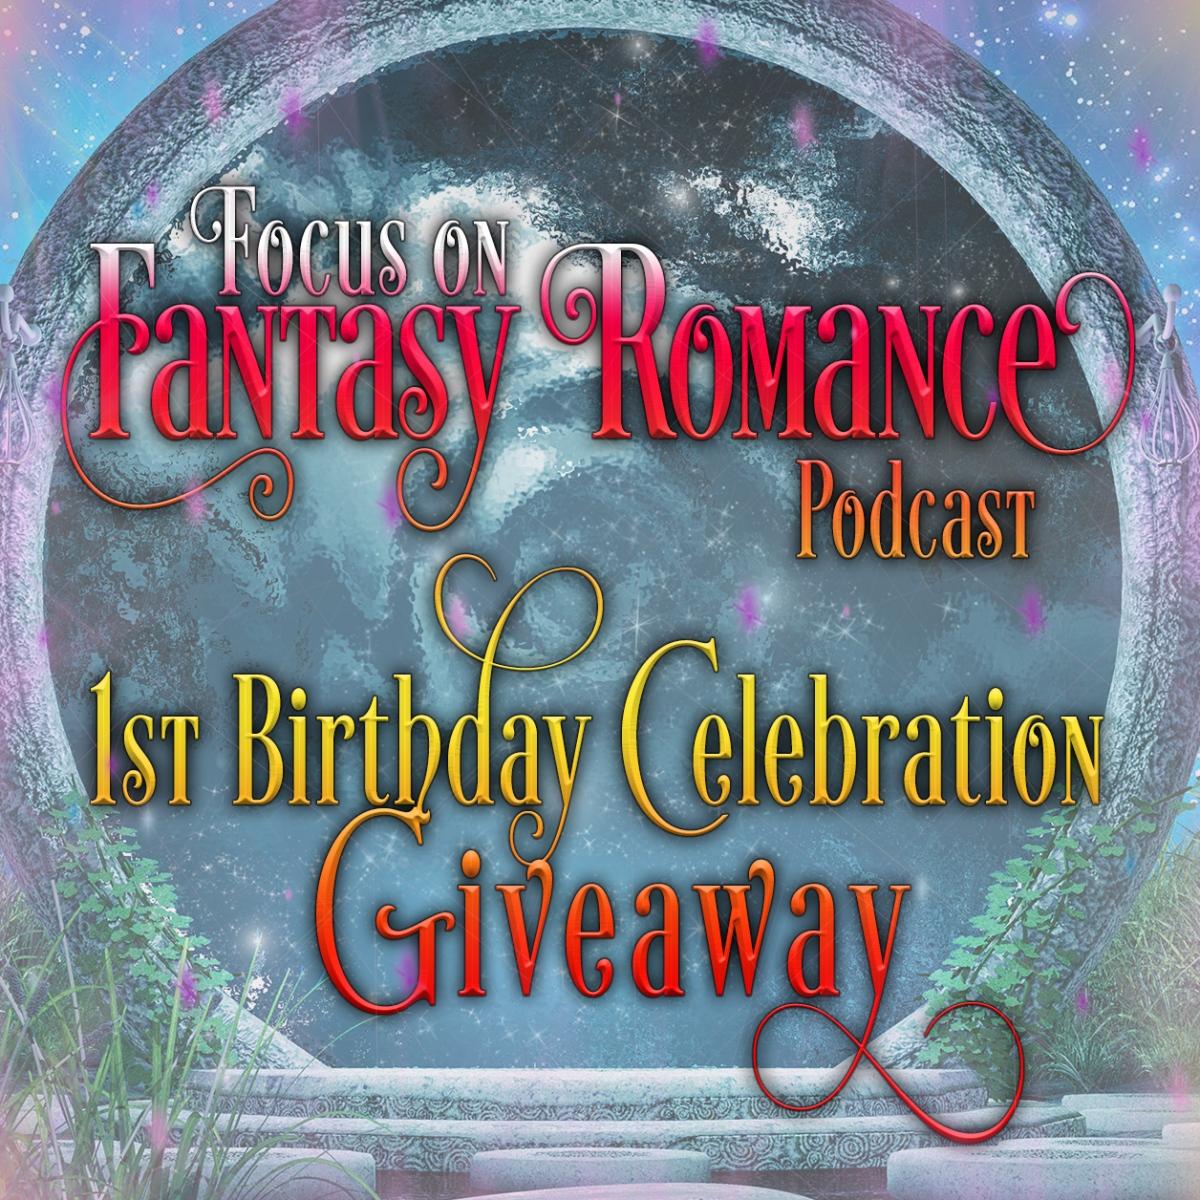 Happy Birthday Focus on Fantasy Romance!